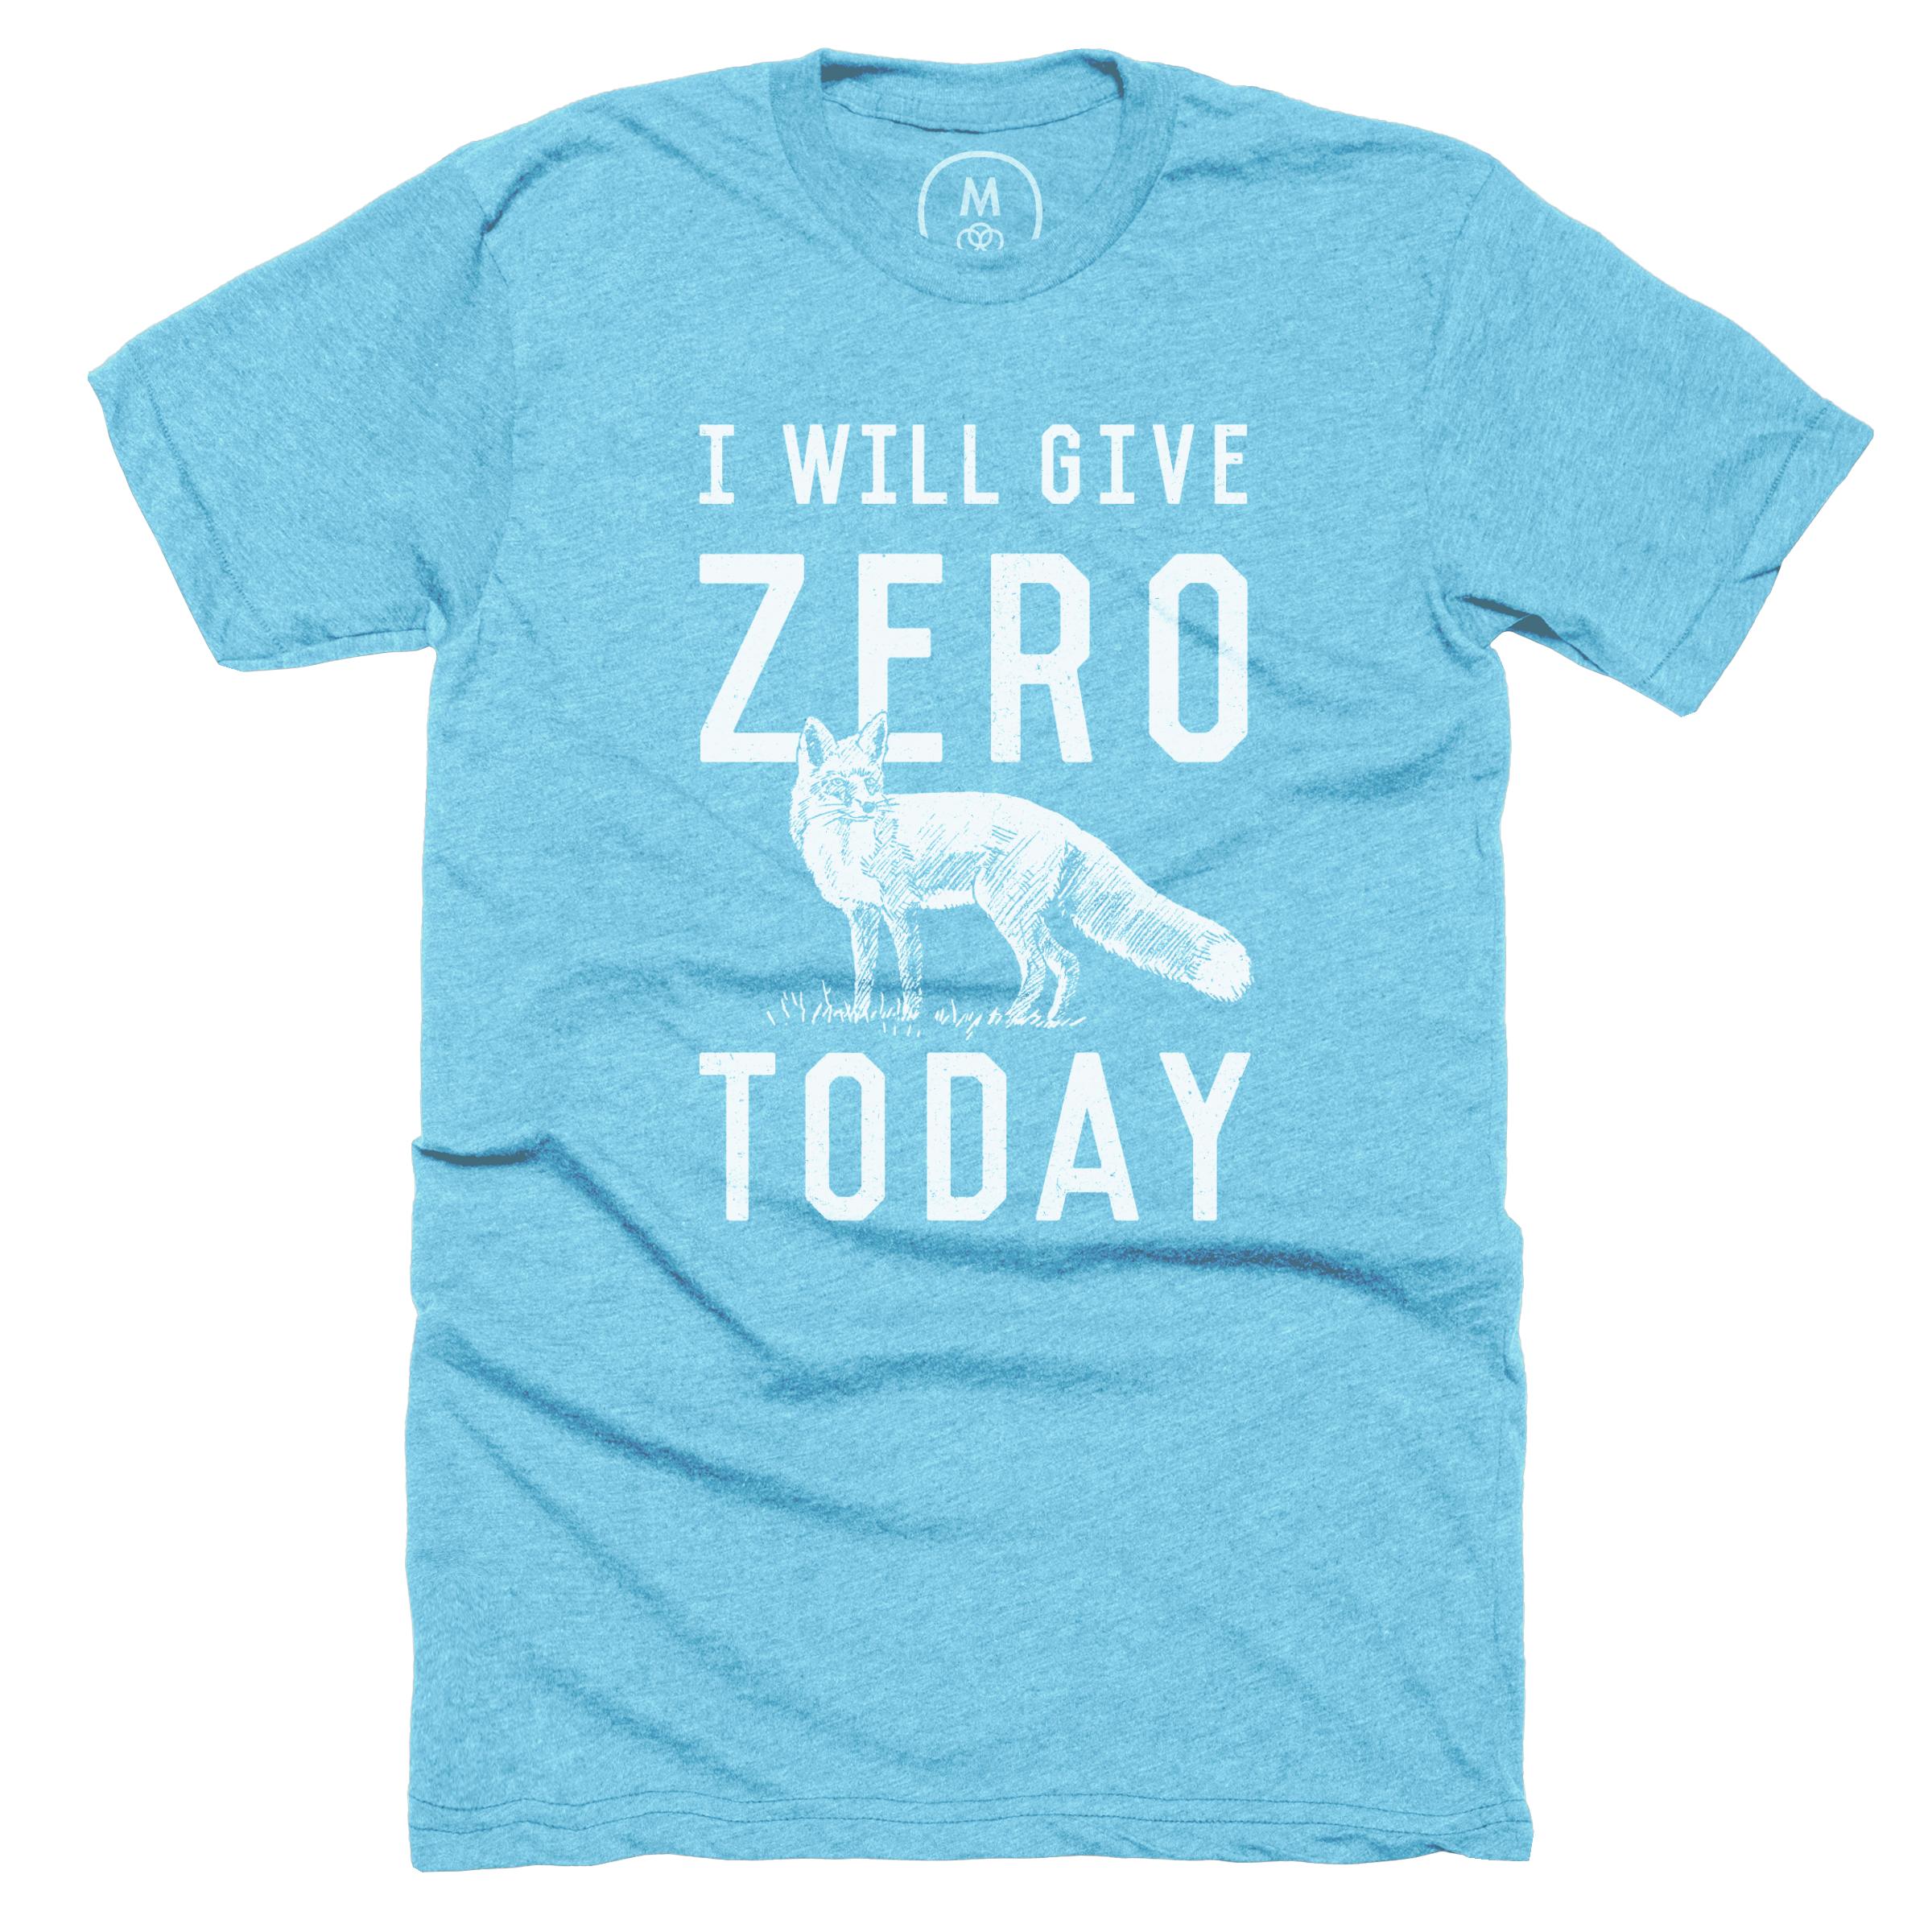 I Will Give Zero Fox Today Bondi Blue (Men's)